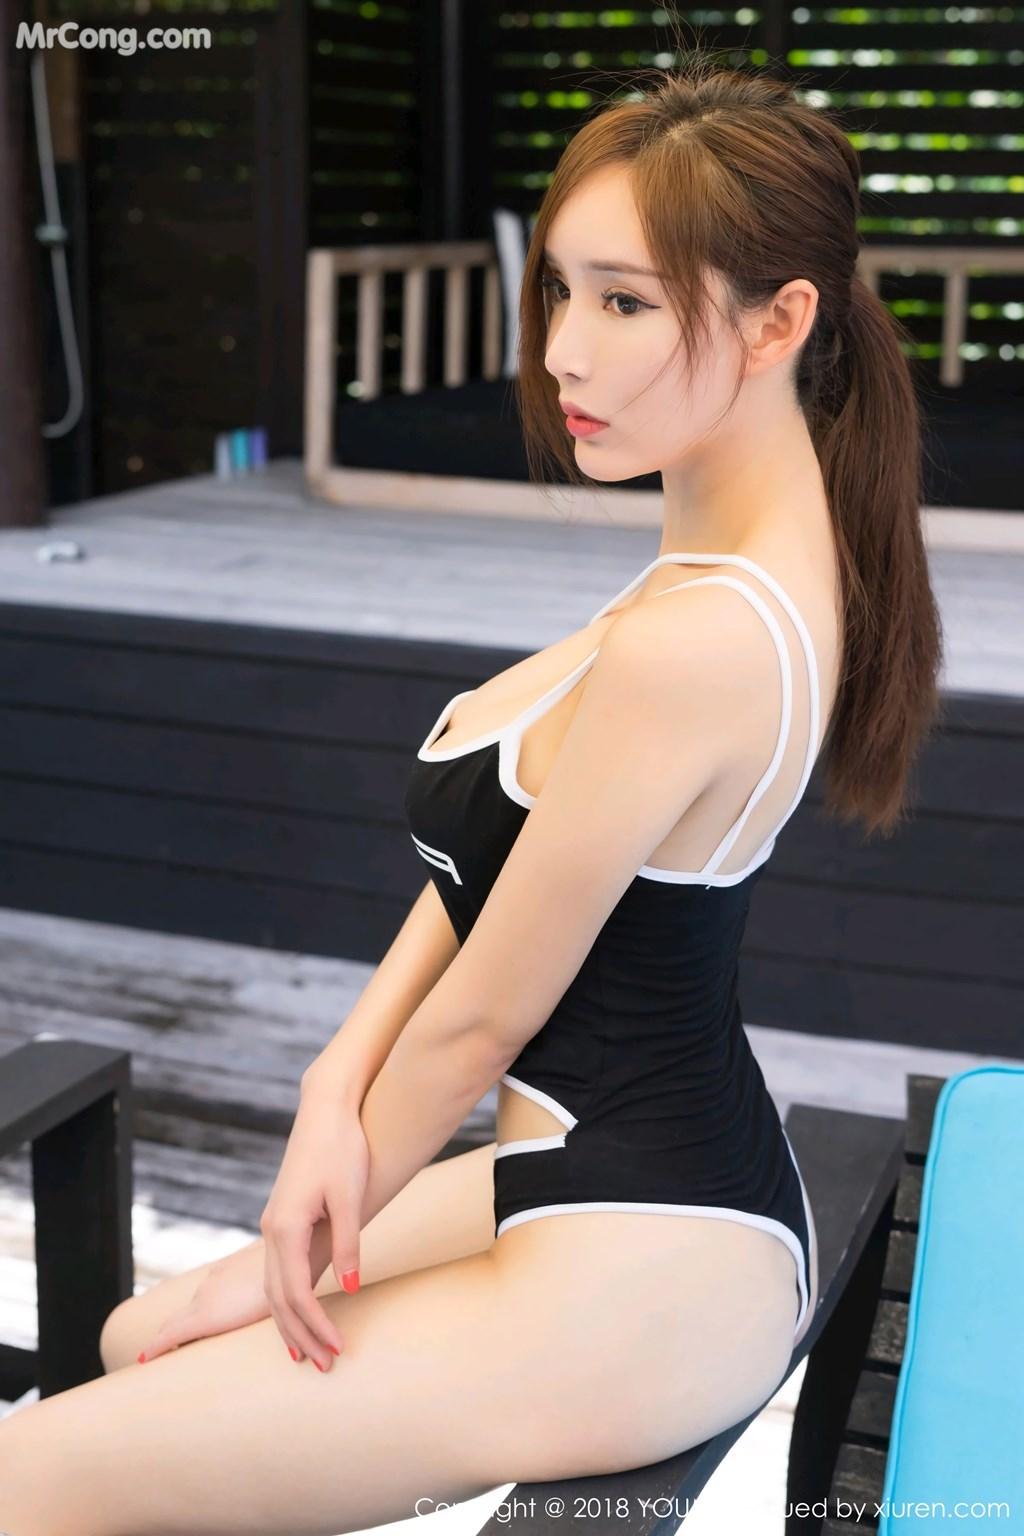 Image YouMi-Vol.230-Tu-Fei-Yuan-Ai-Cuo-Qiong-MrCong.com-009 in post YouMi Vol.230: Người mẫu 奶瓶土肥圆 (44 ảnh)